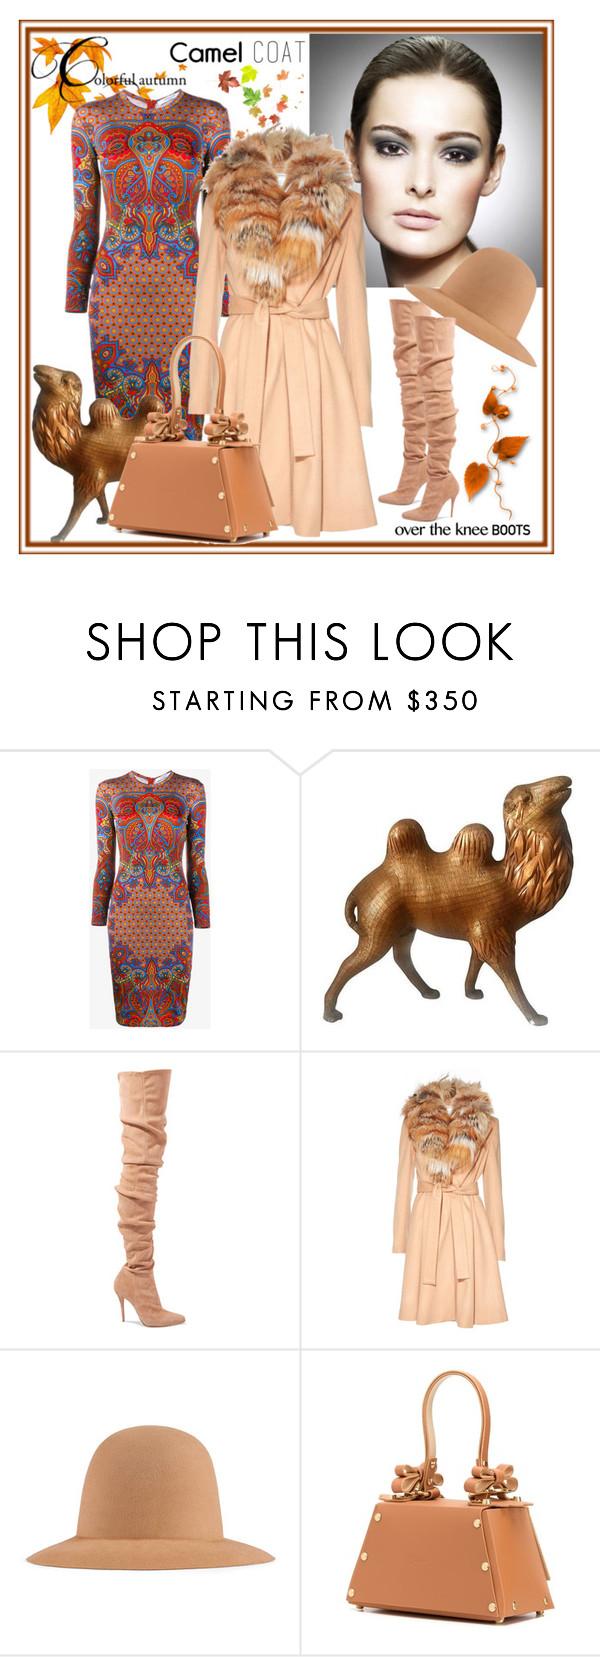 Camel Coat & Over.